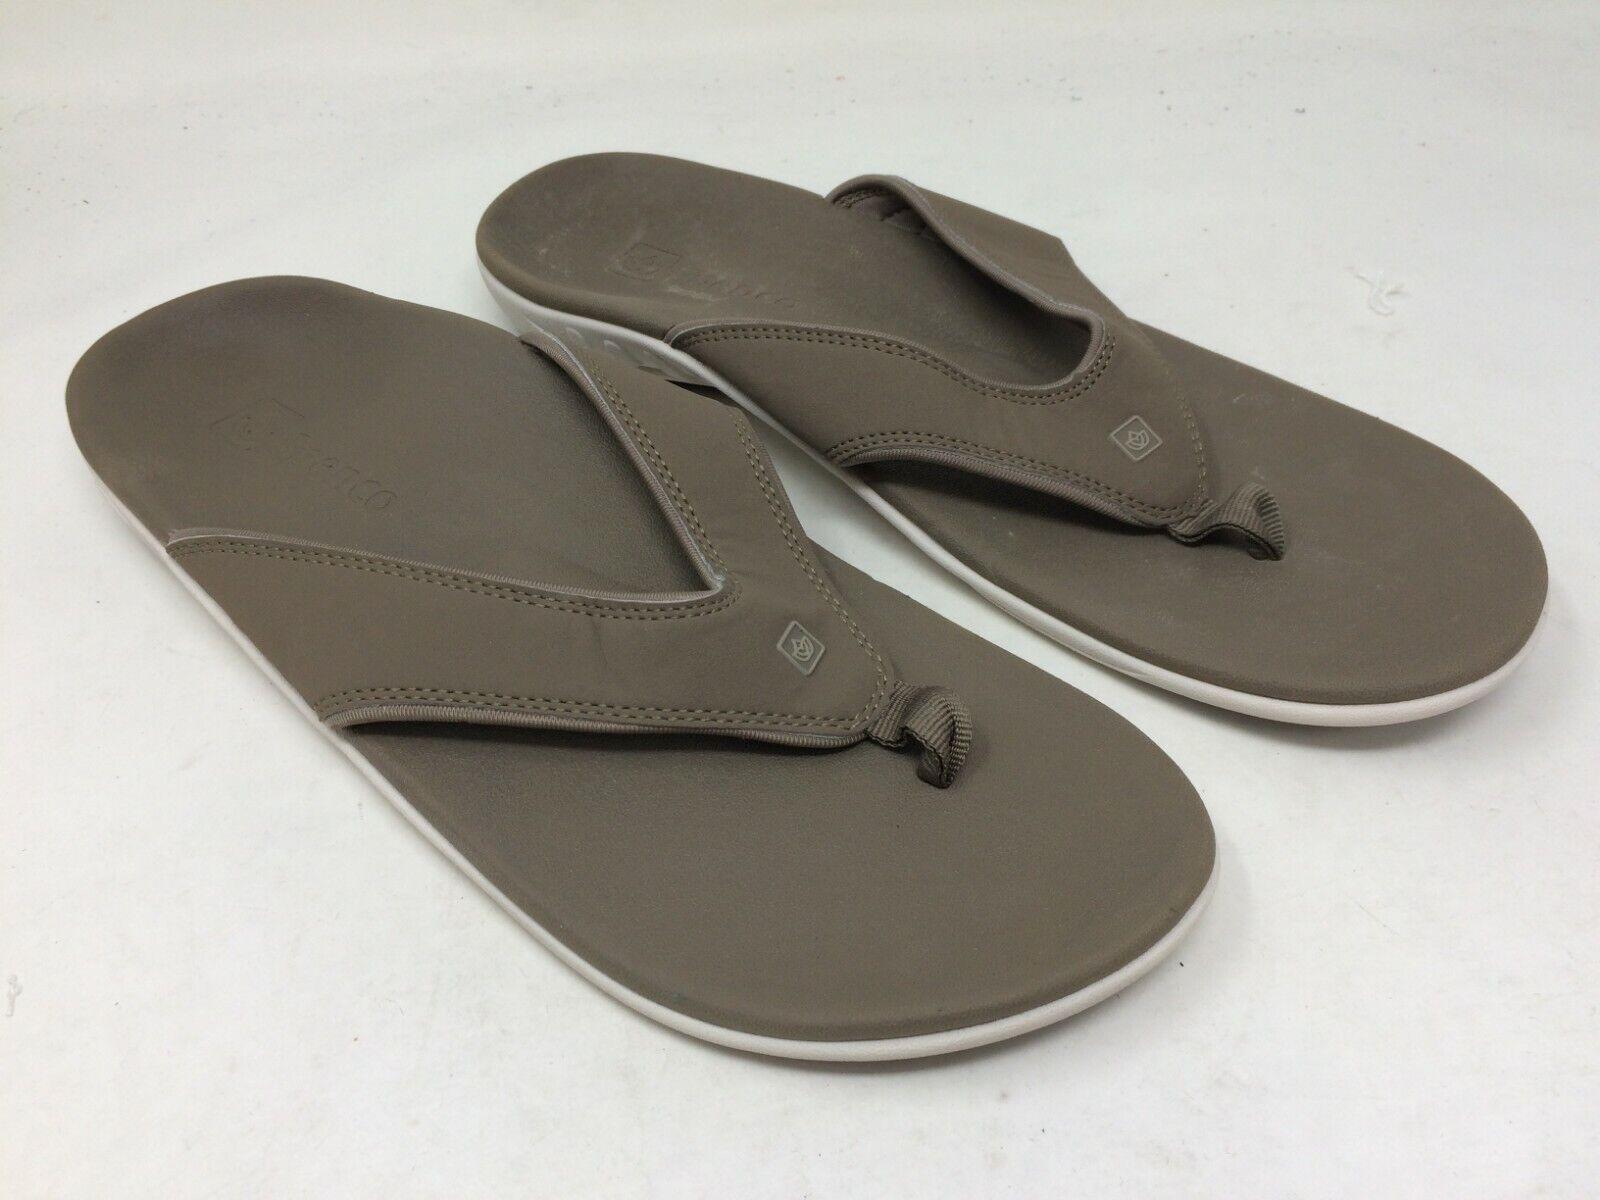 New     Men's  Spenco Yumi Sandal Tan  M64